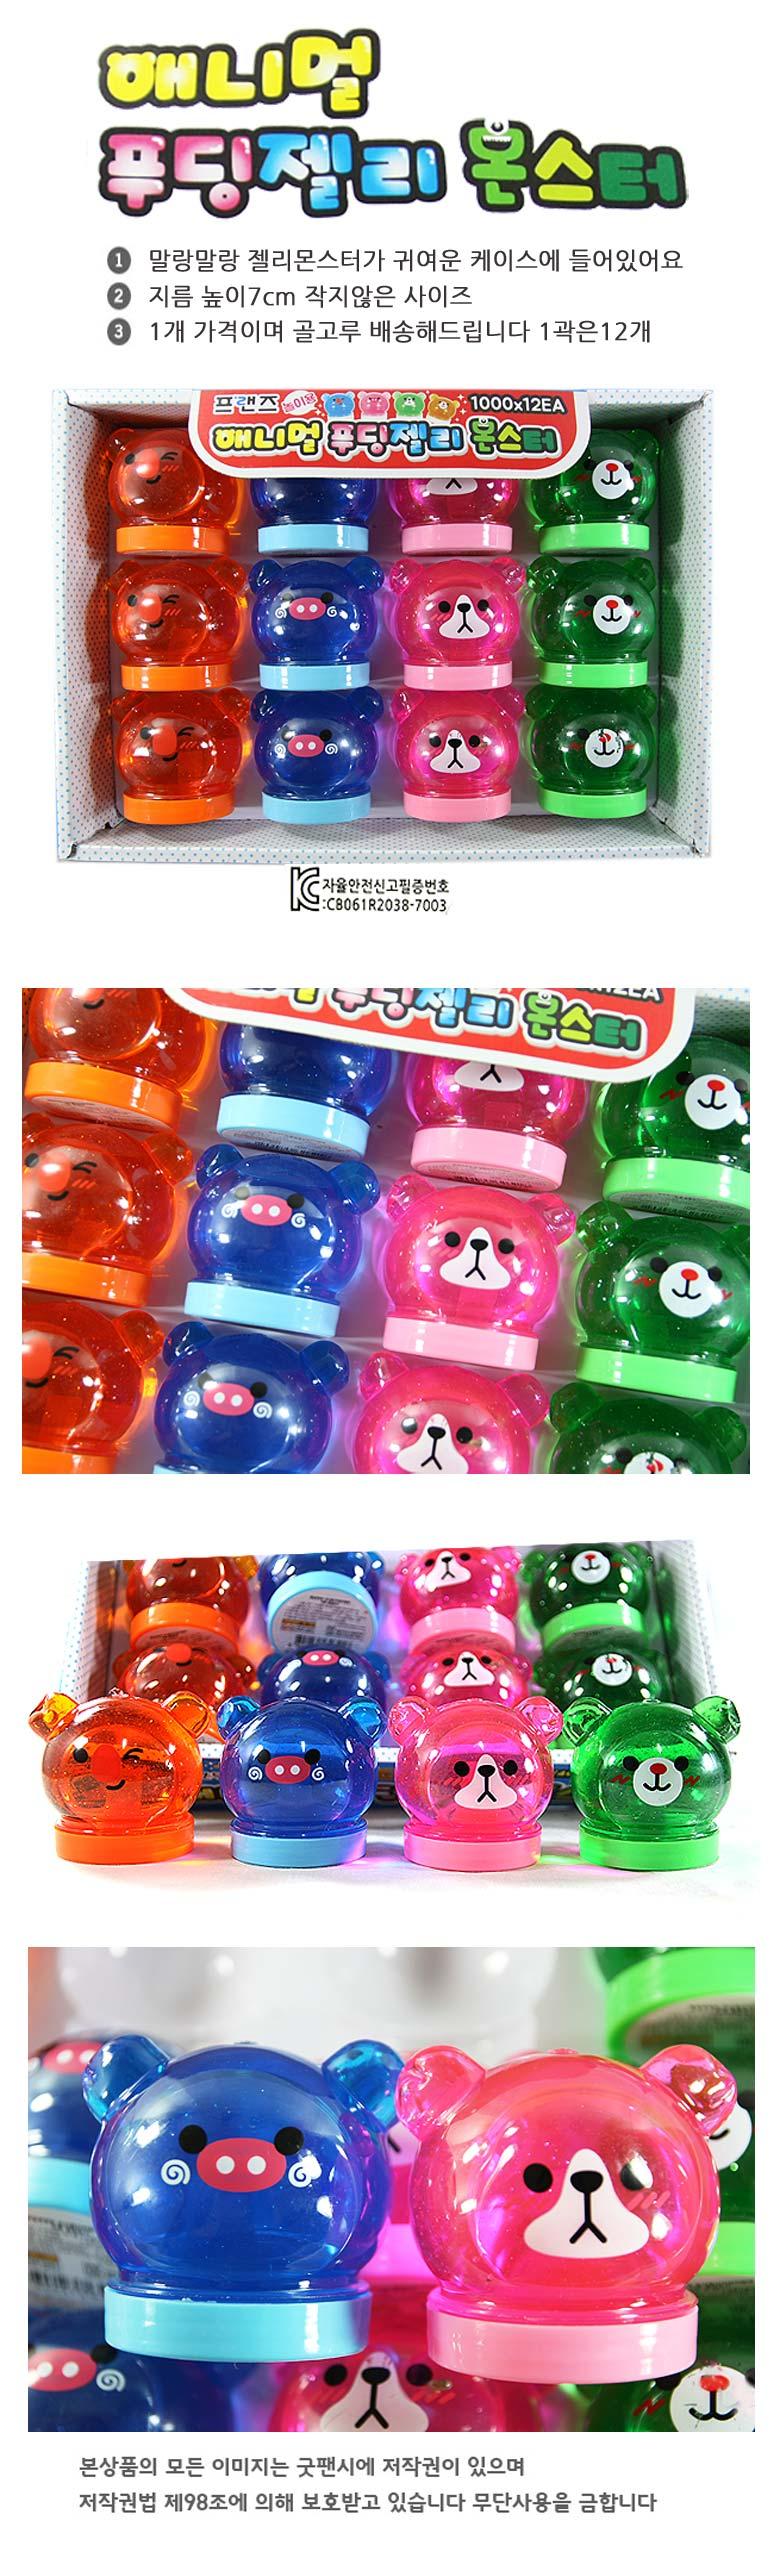 F 애니멀푸딩젤리몬스터 - 굿팬시, 1,000원, 놀이용품, 장난감